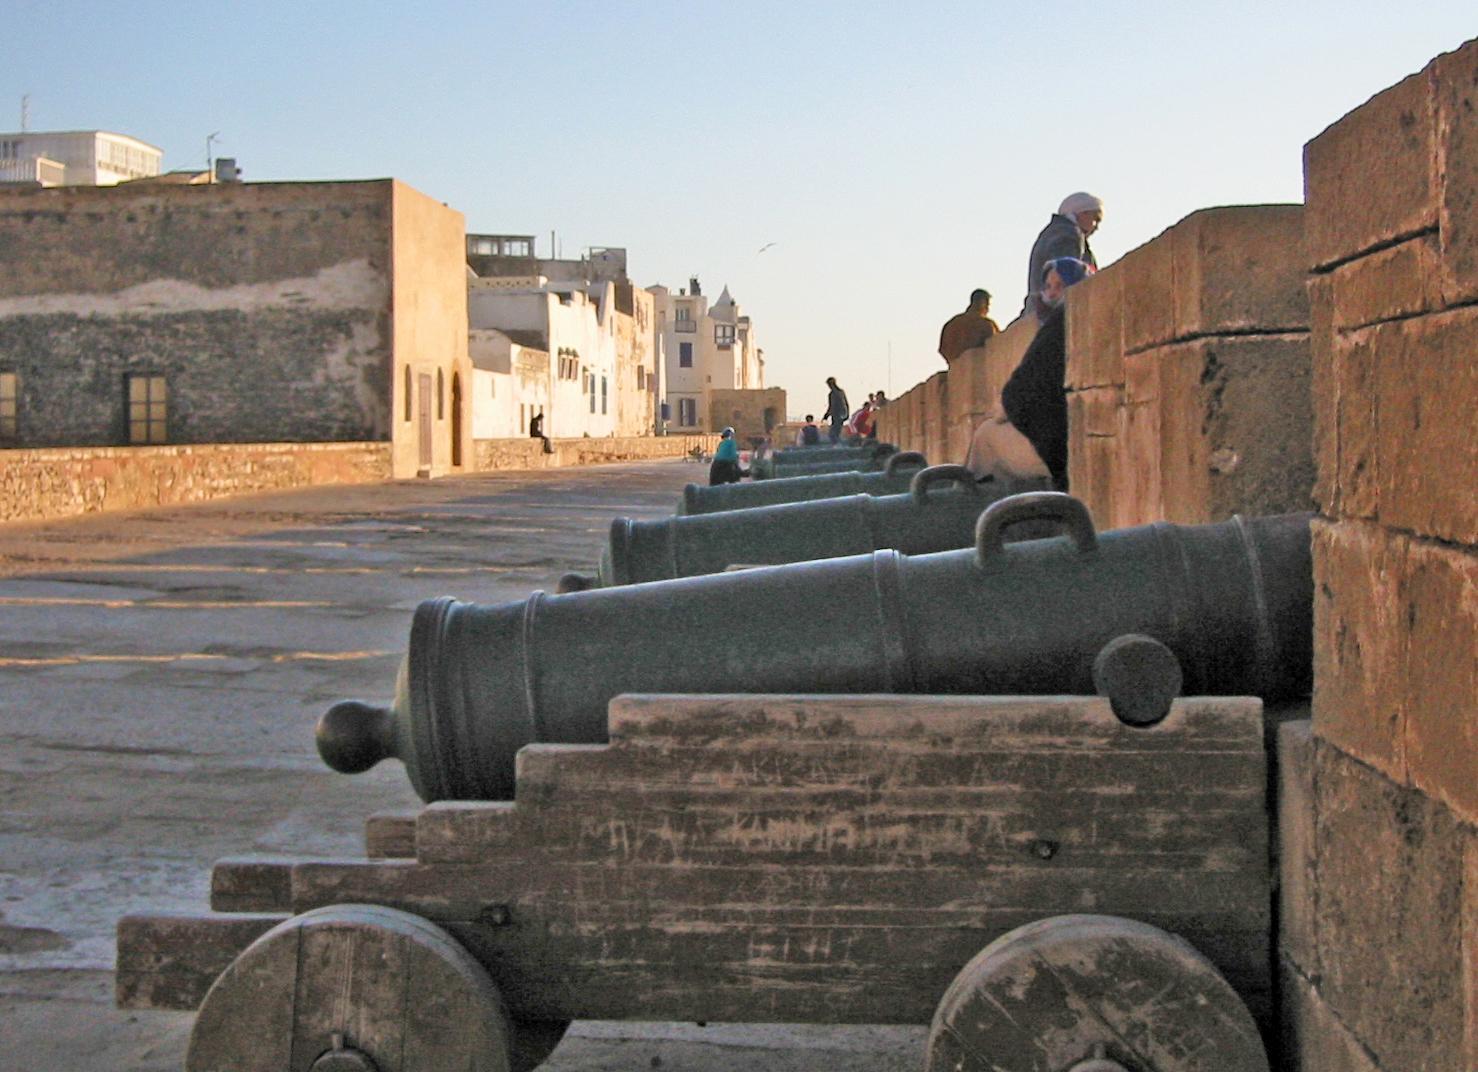 Fortet på utsiden av medinaen i Essaouira.